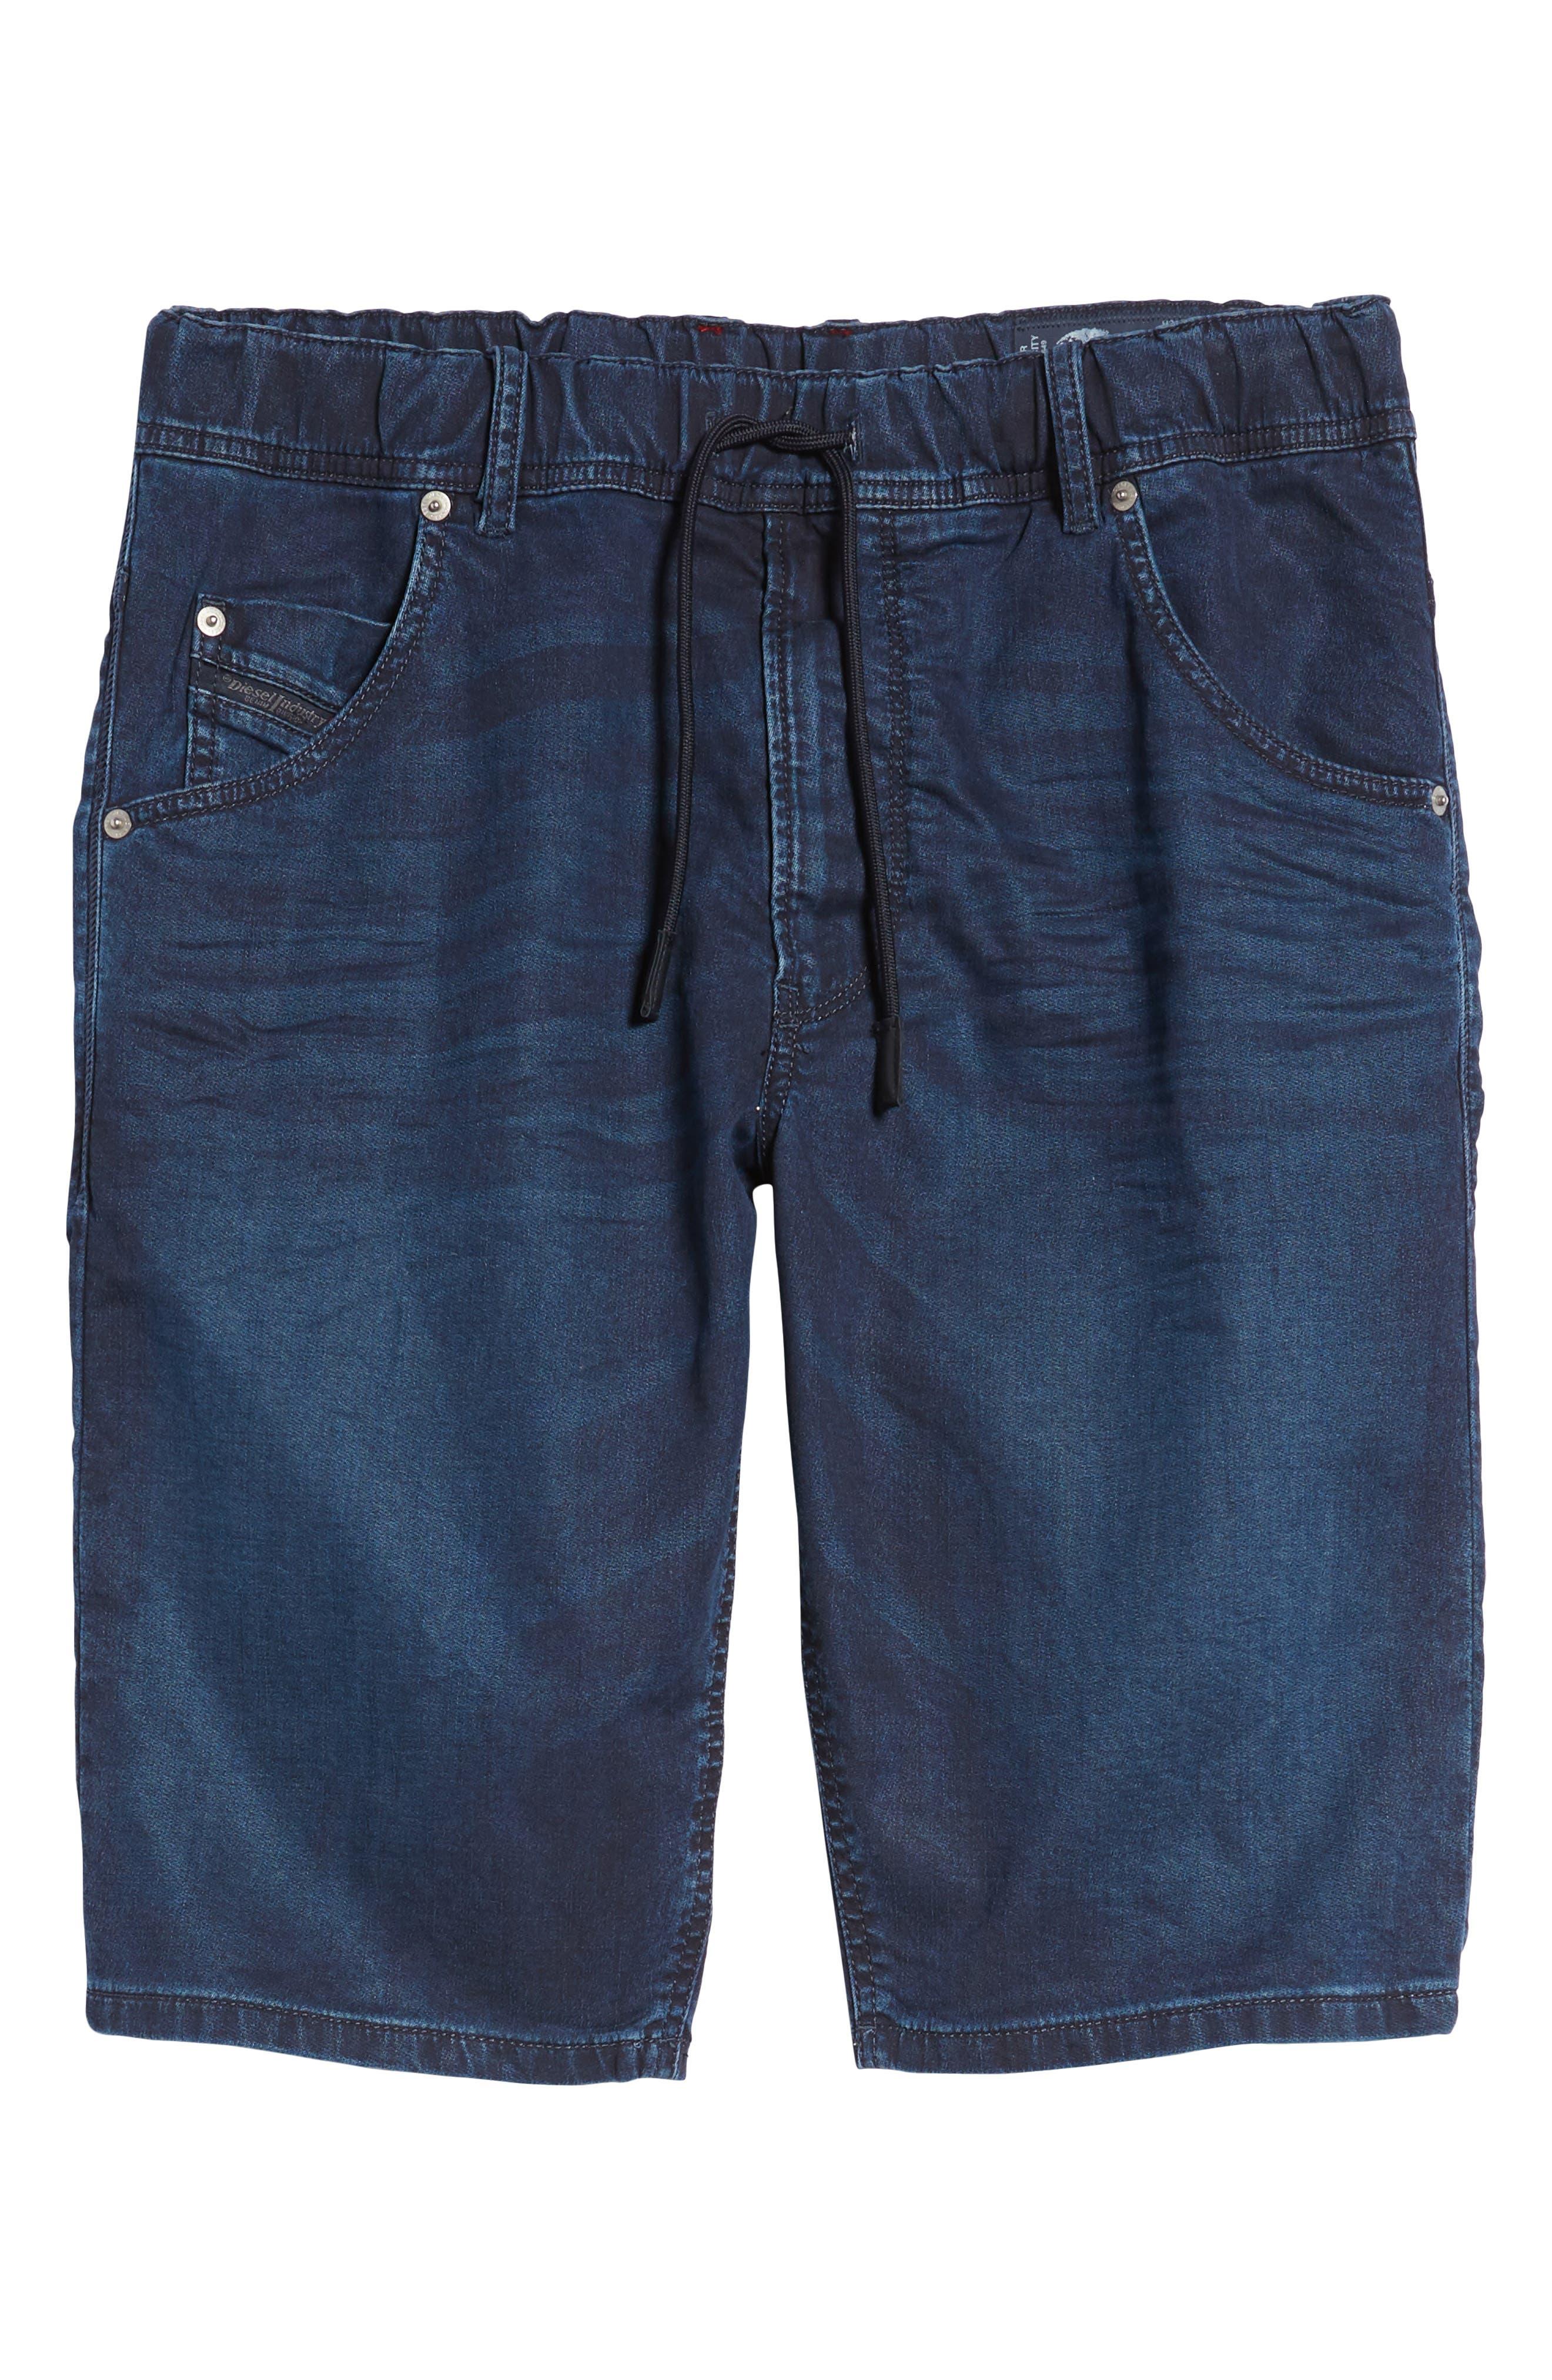 Krooshort Denim Shorts,                             Alternate thumbnail 6, color,                             0699C